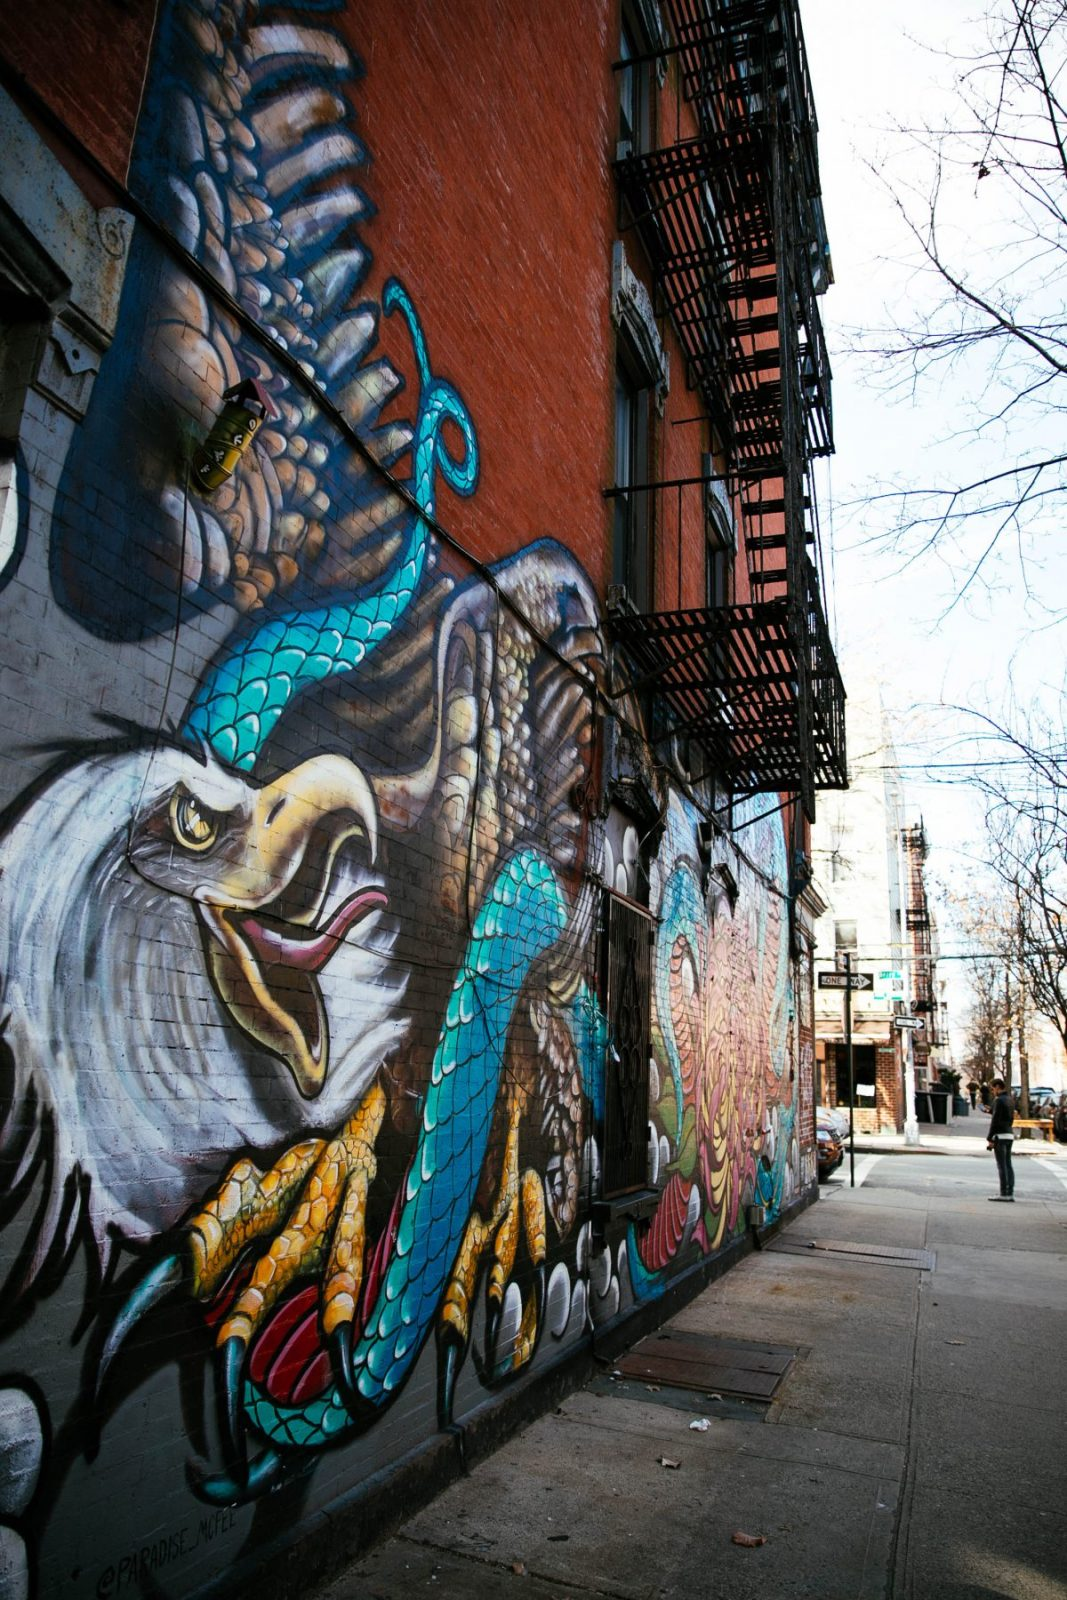 Williamsburg_NYC_Hotspots_Mattgstyle_1